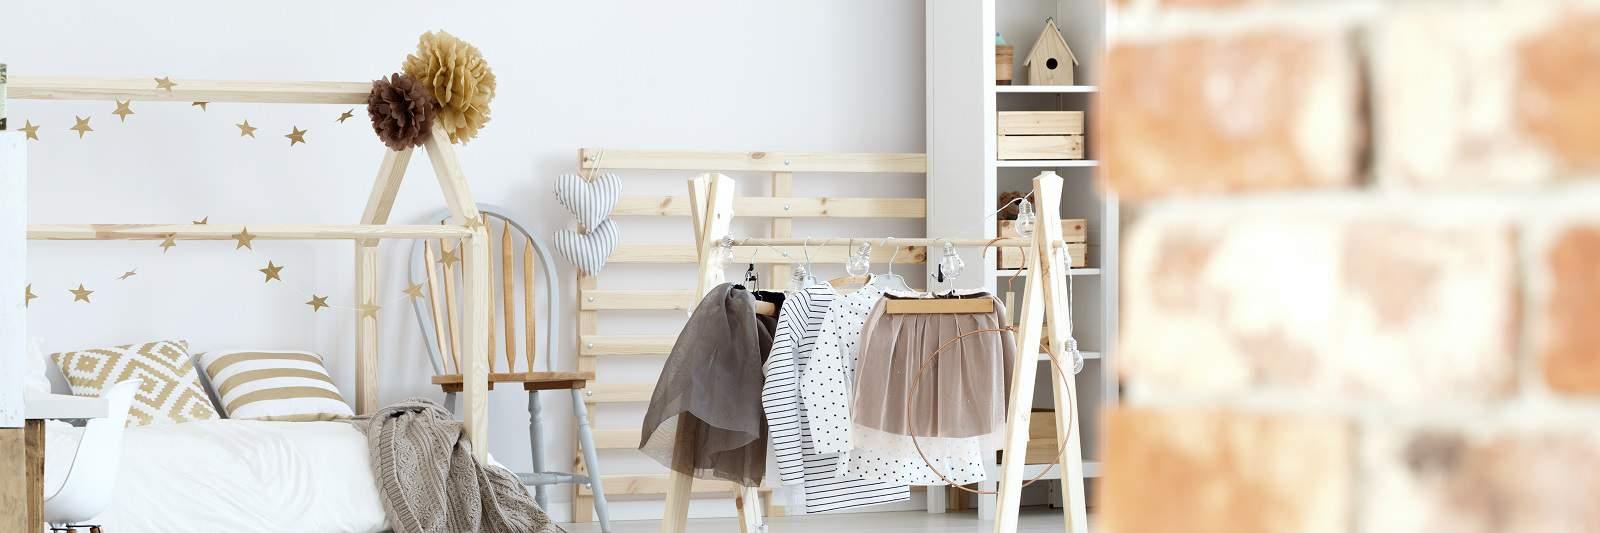 20+ Best Diy Clothes Rack Ideas